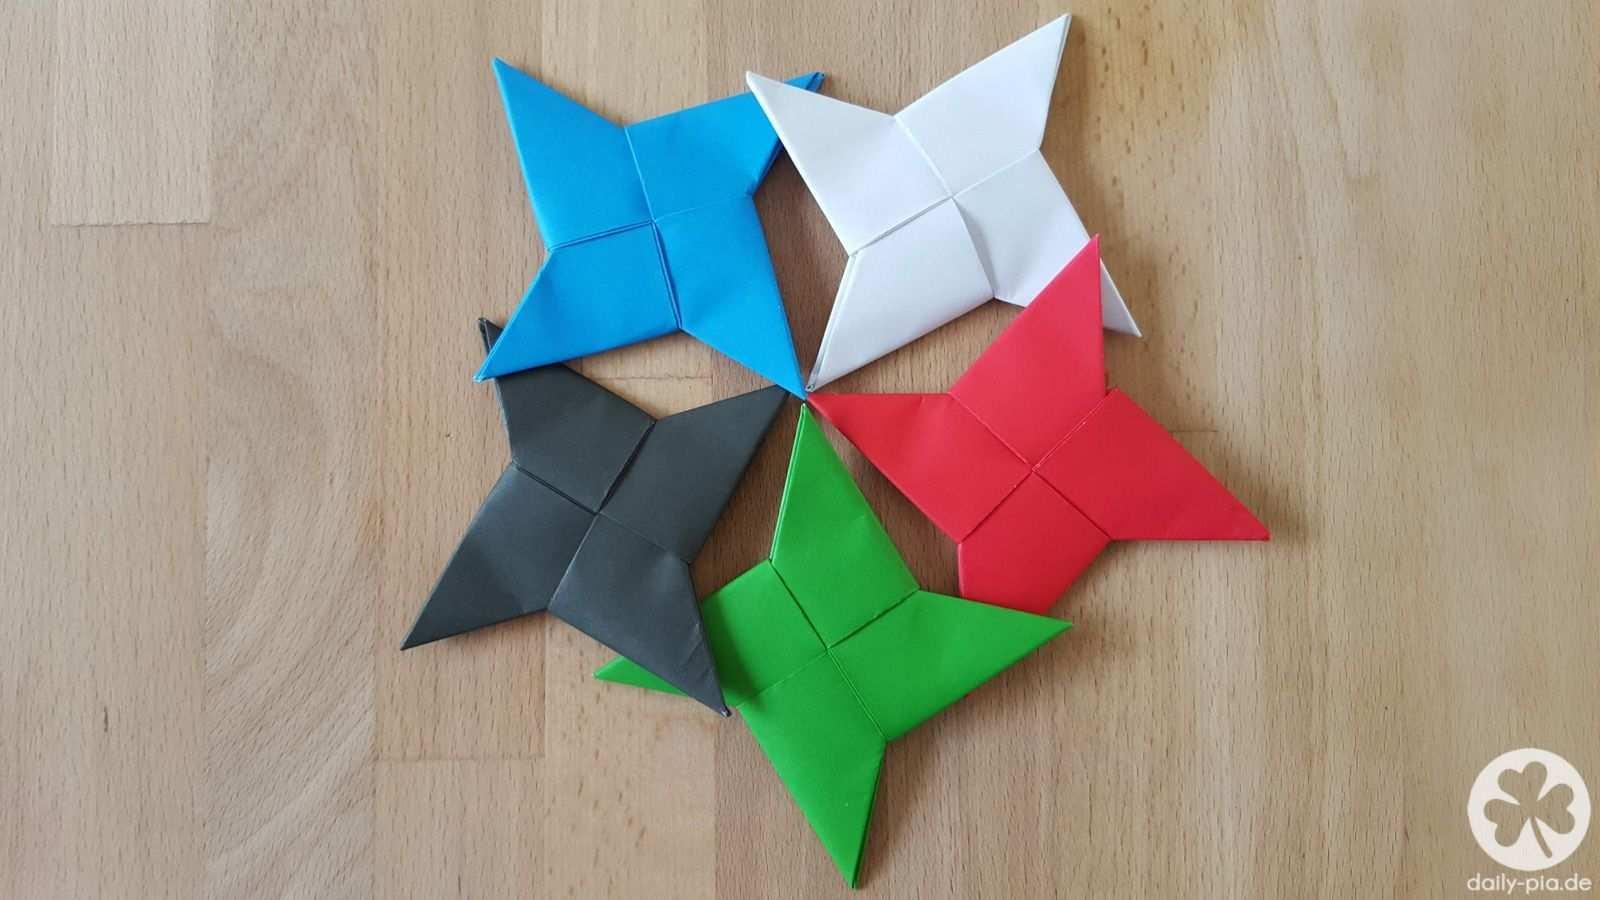 Bis Einer Heult Diy Wurfstern Ninjastern Origami Uncategorized Origami Cat In 2020 Ninjago Birthday Party Ninja Star Origami Lego Ninjago Party